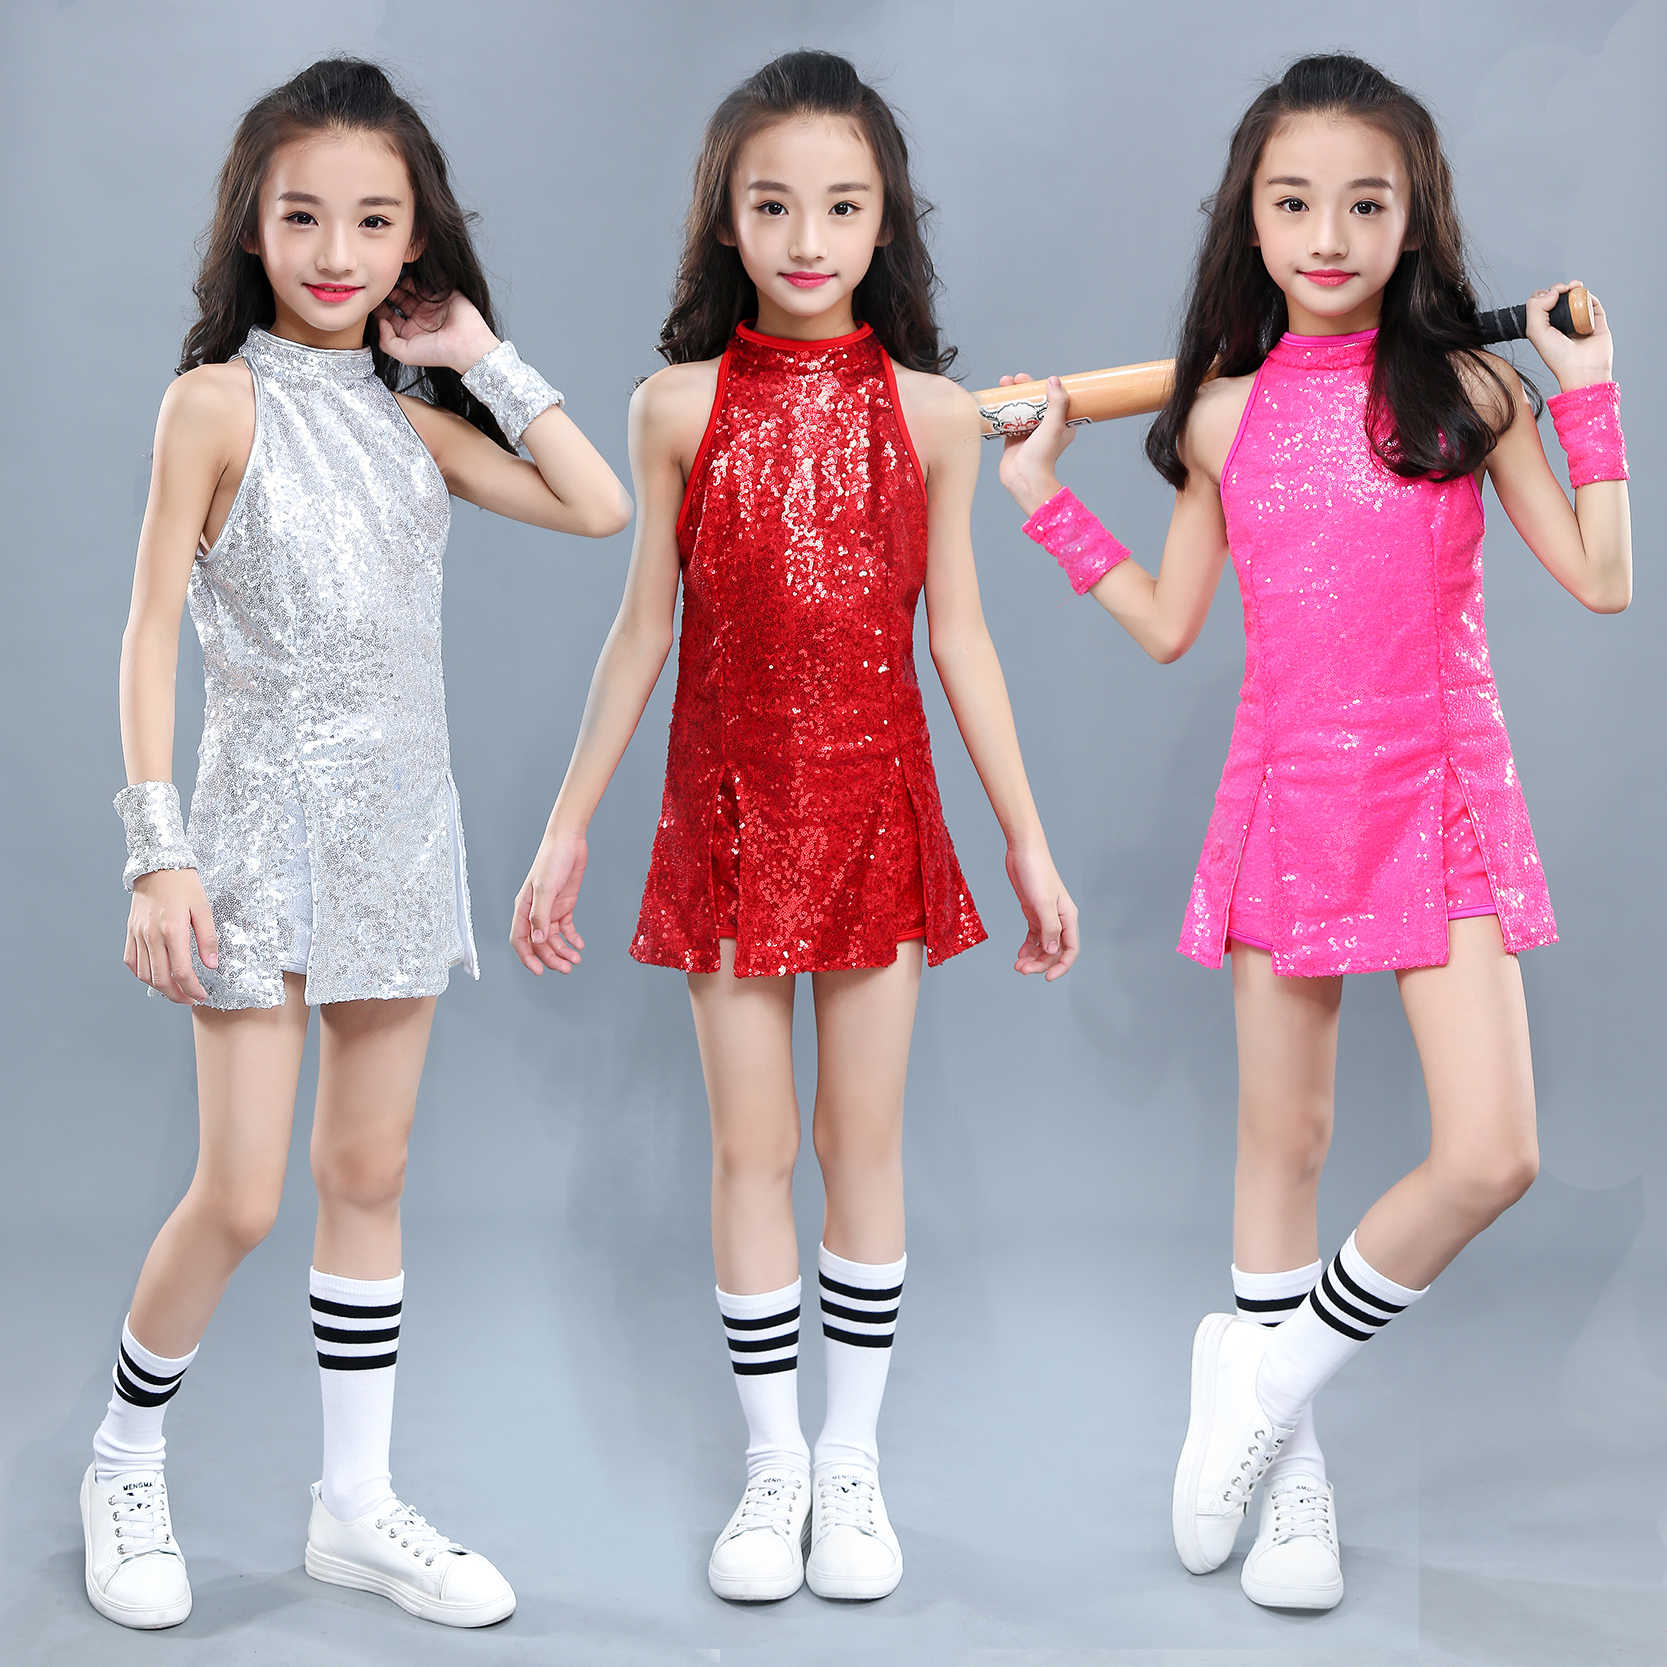 Paillette Children Jazz Dance Costume for Stage Performance Hip-hop Dance  Clothing Cheerleading Uniform Street DJ Dance Clothing